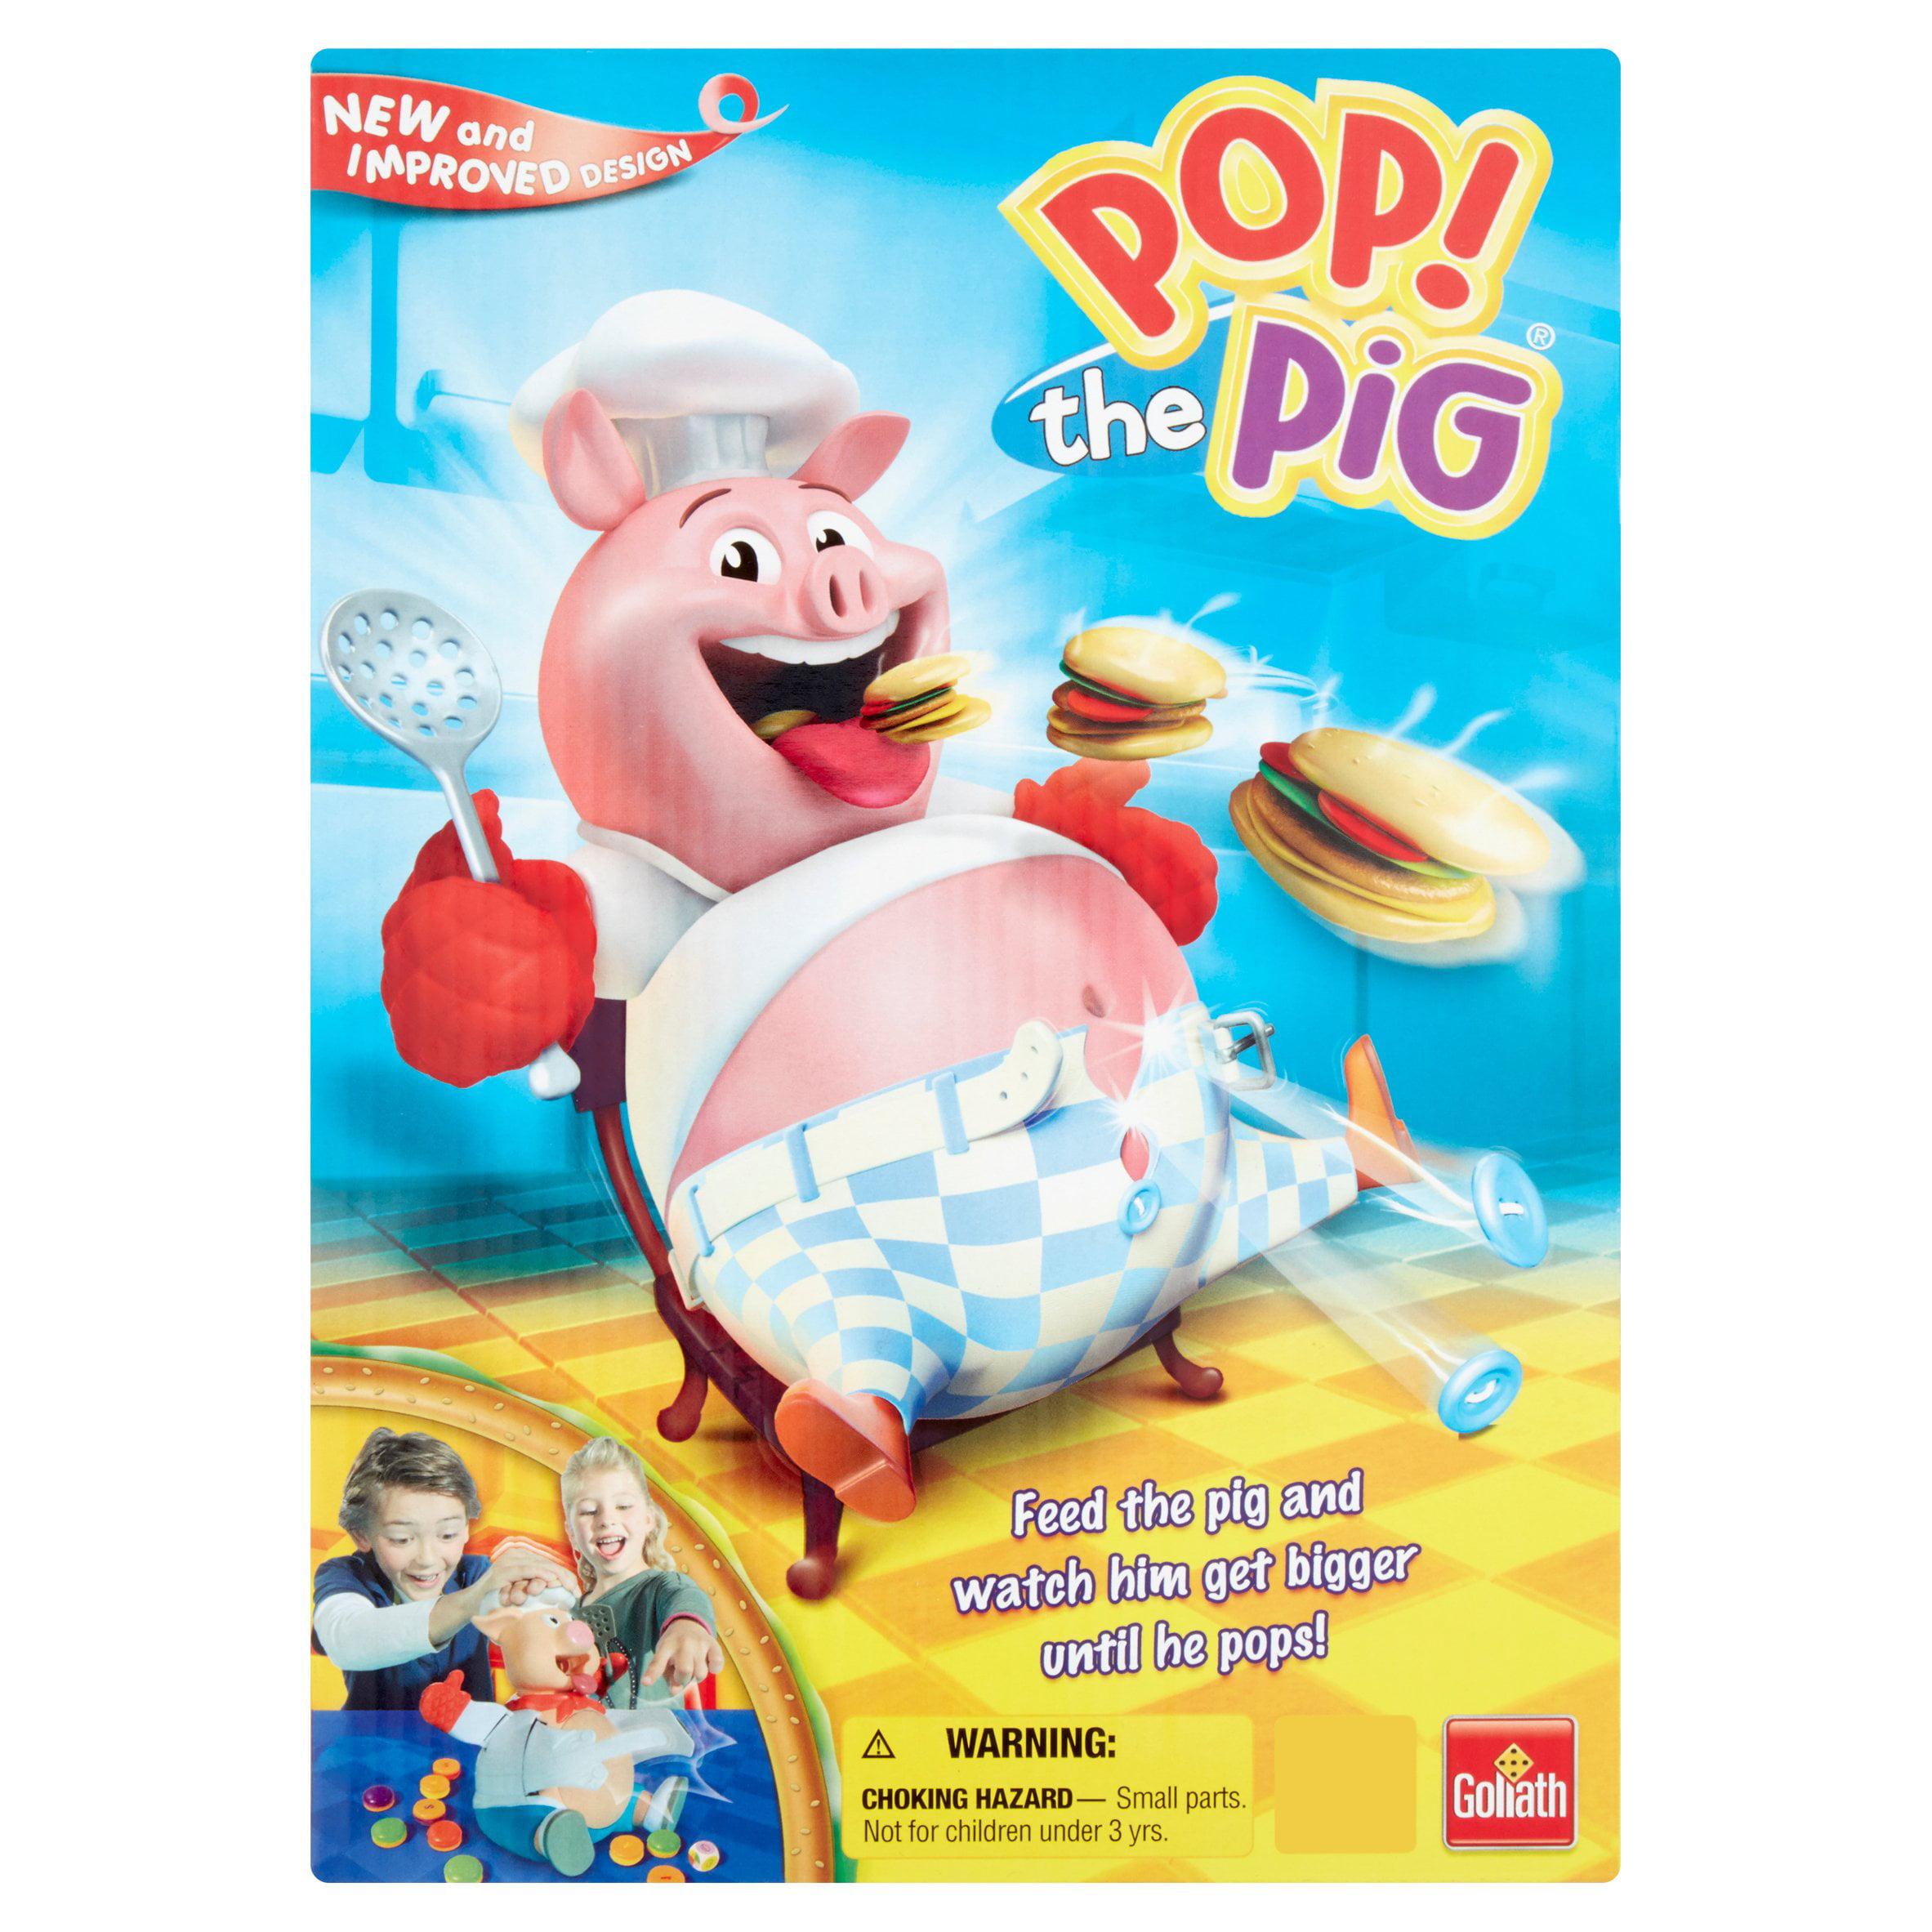 Pig coupons